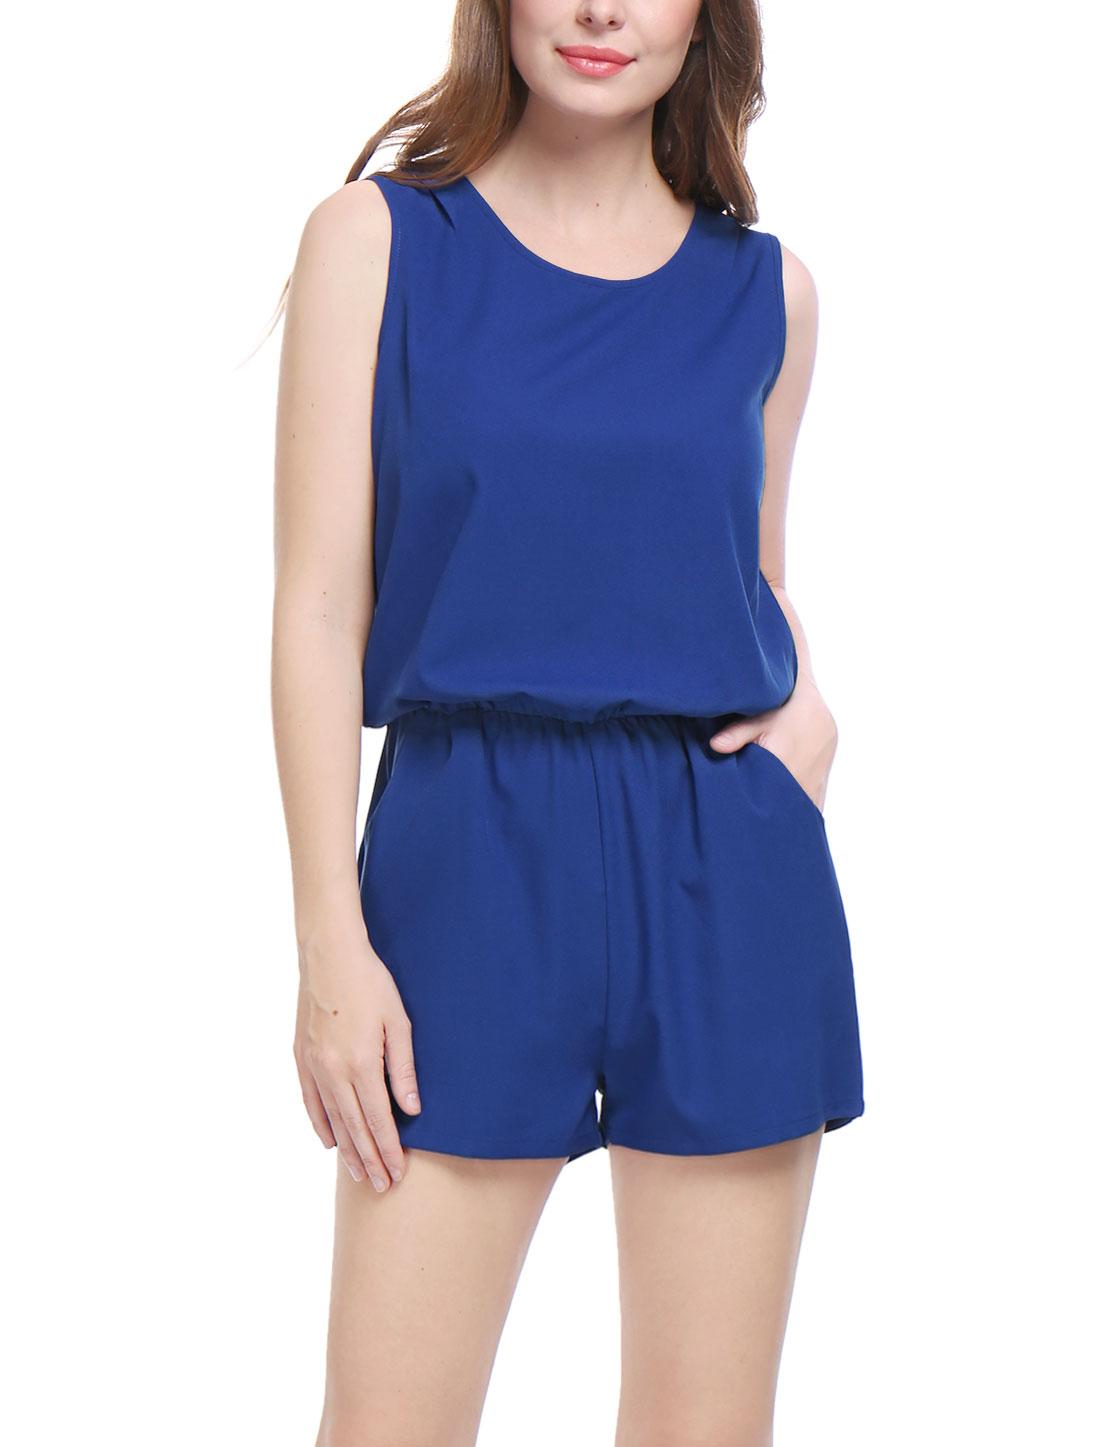 Women Sleeveless Cut Out Back Elastic Waist Romper Dark Blue XS